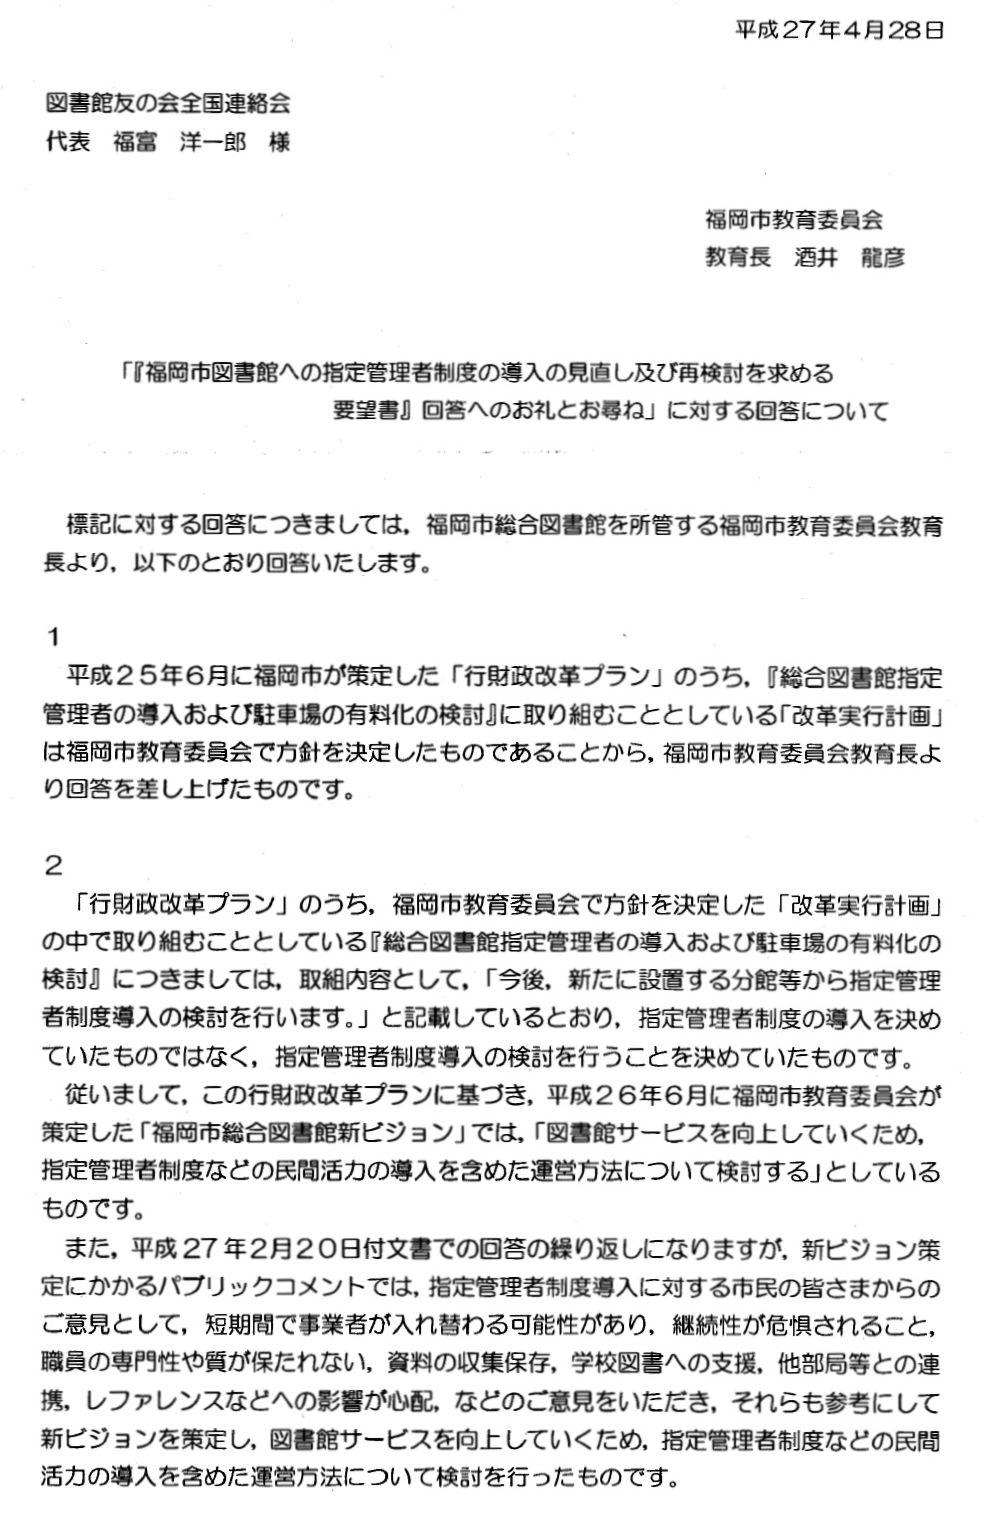 fukuoka-kyouiku-ans20150428